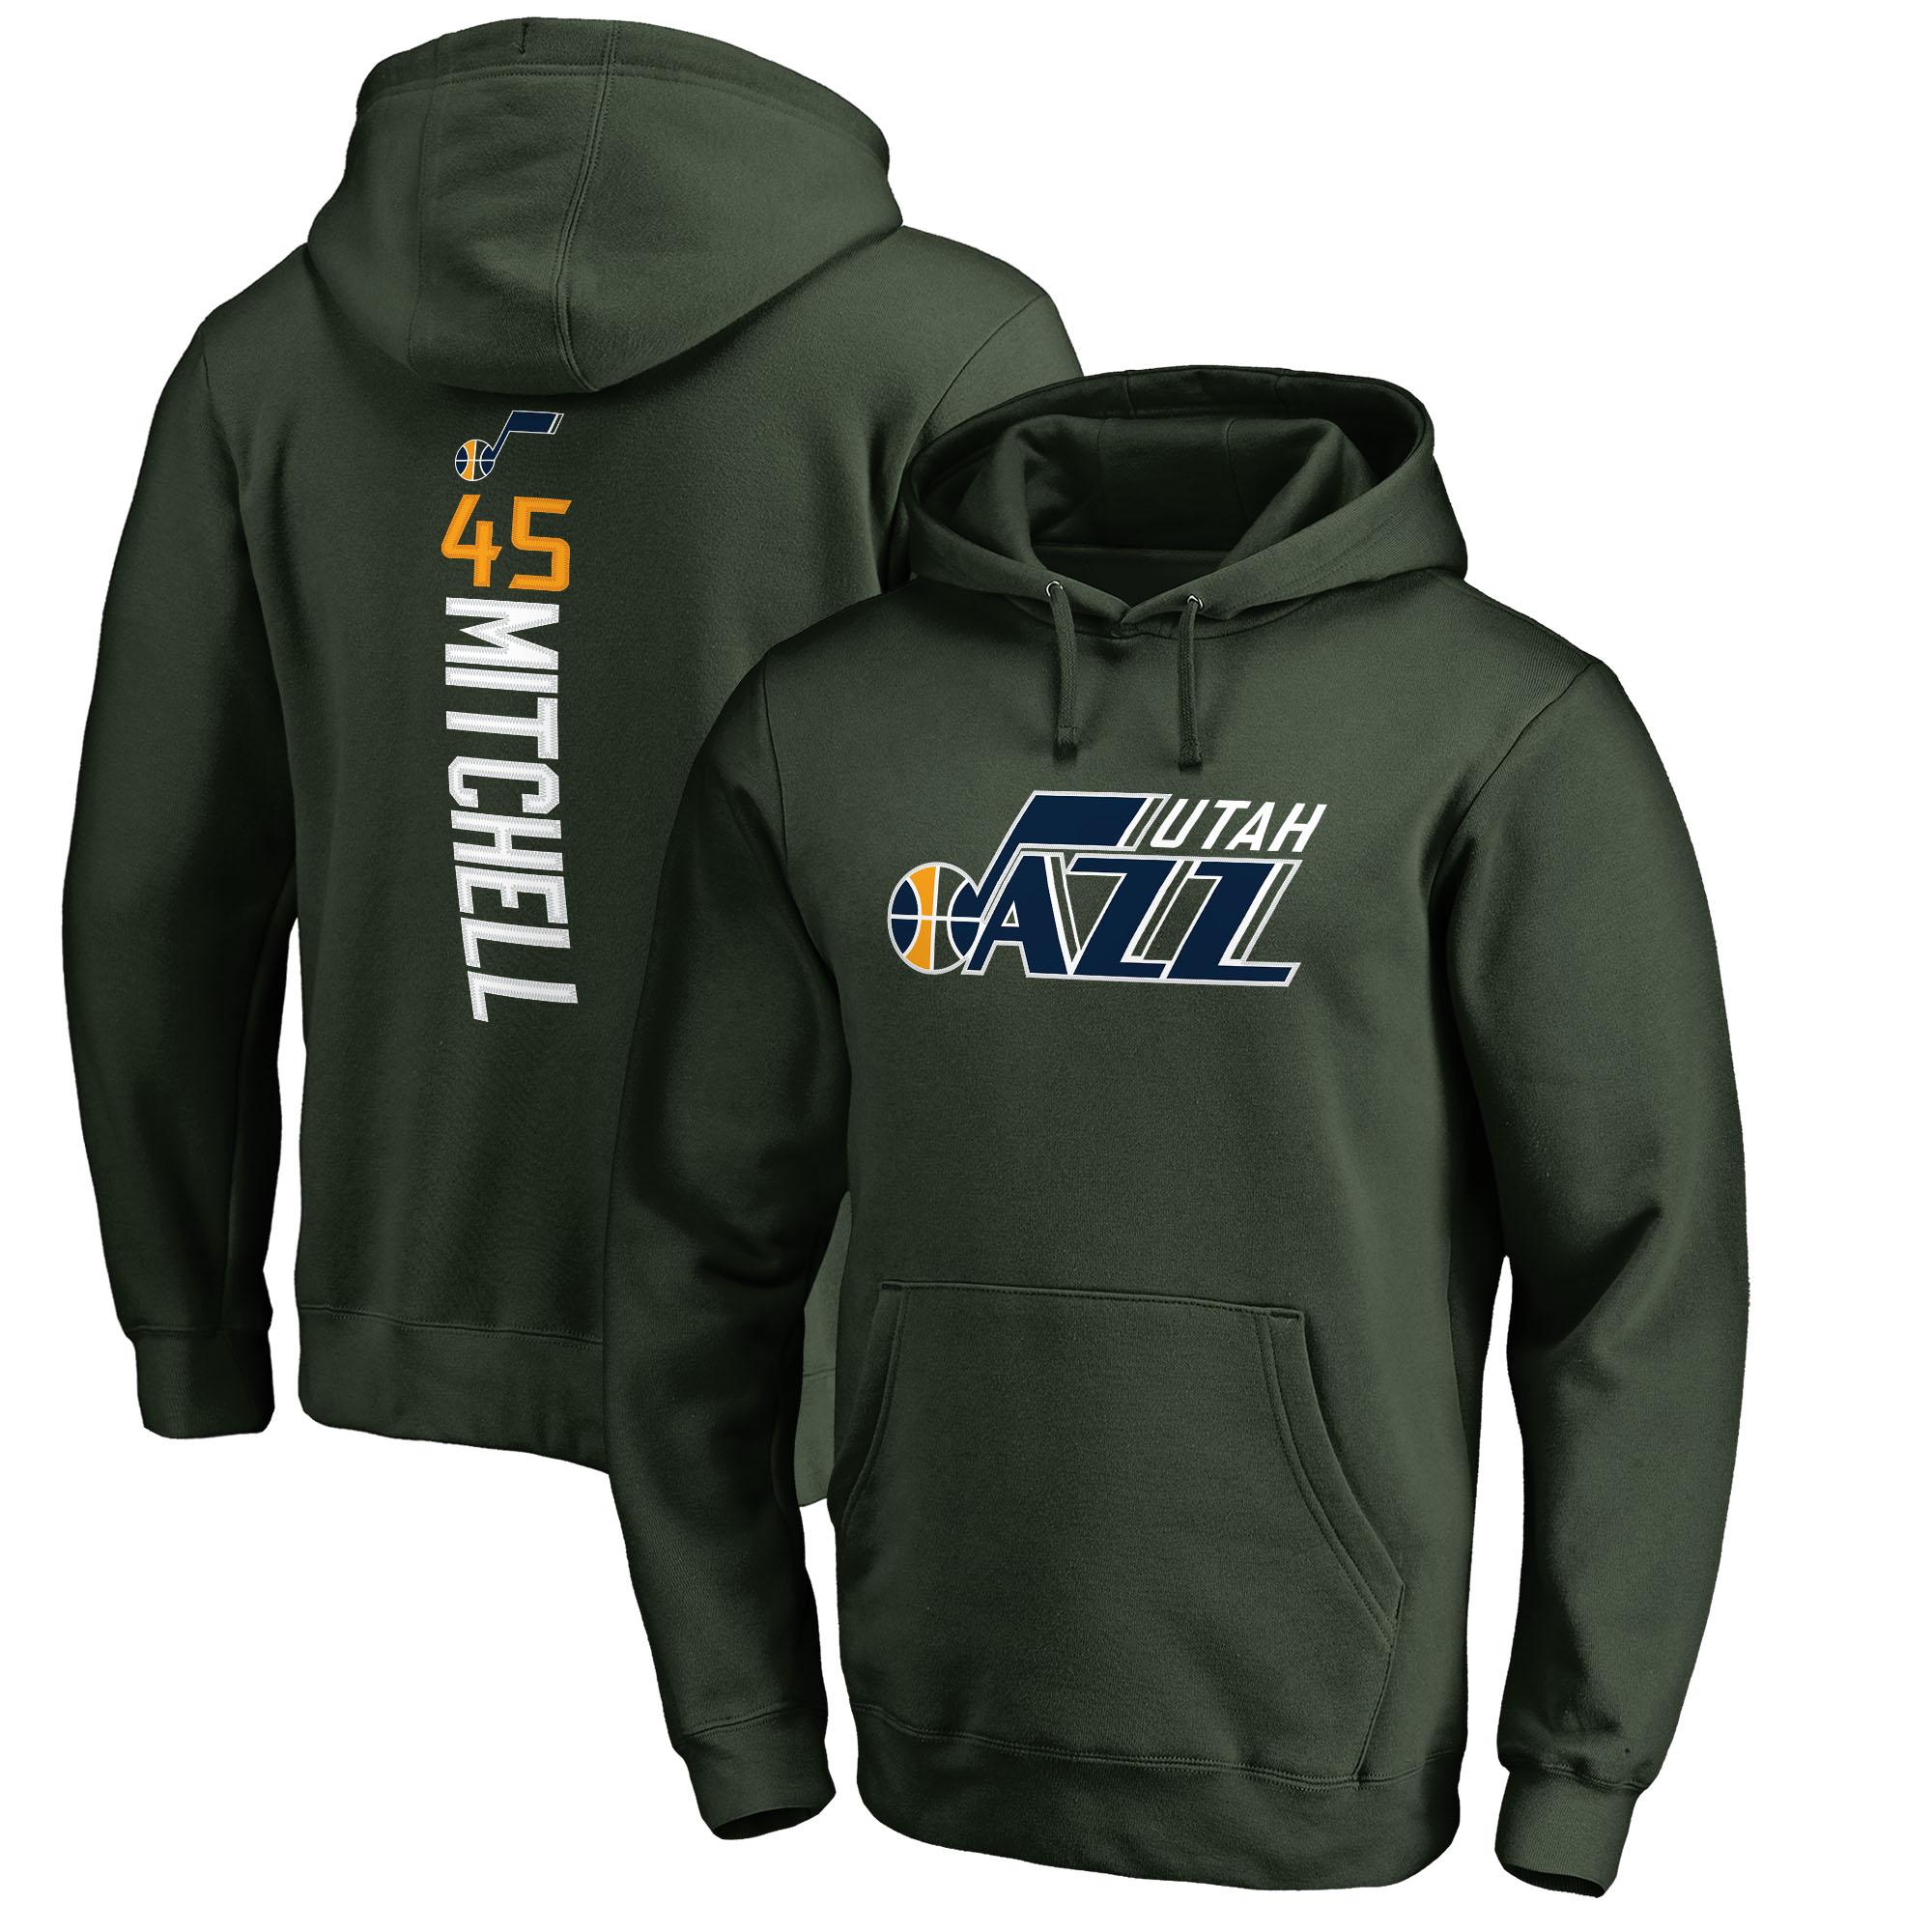 Donovan Mitchell Utah Jazz Fanatics Branded Team Backer Name & Number Pullover Hoodie - Green